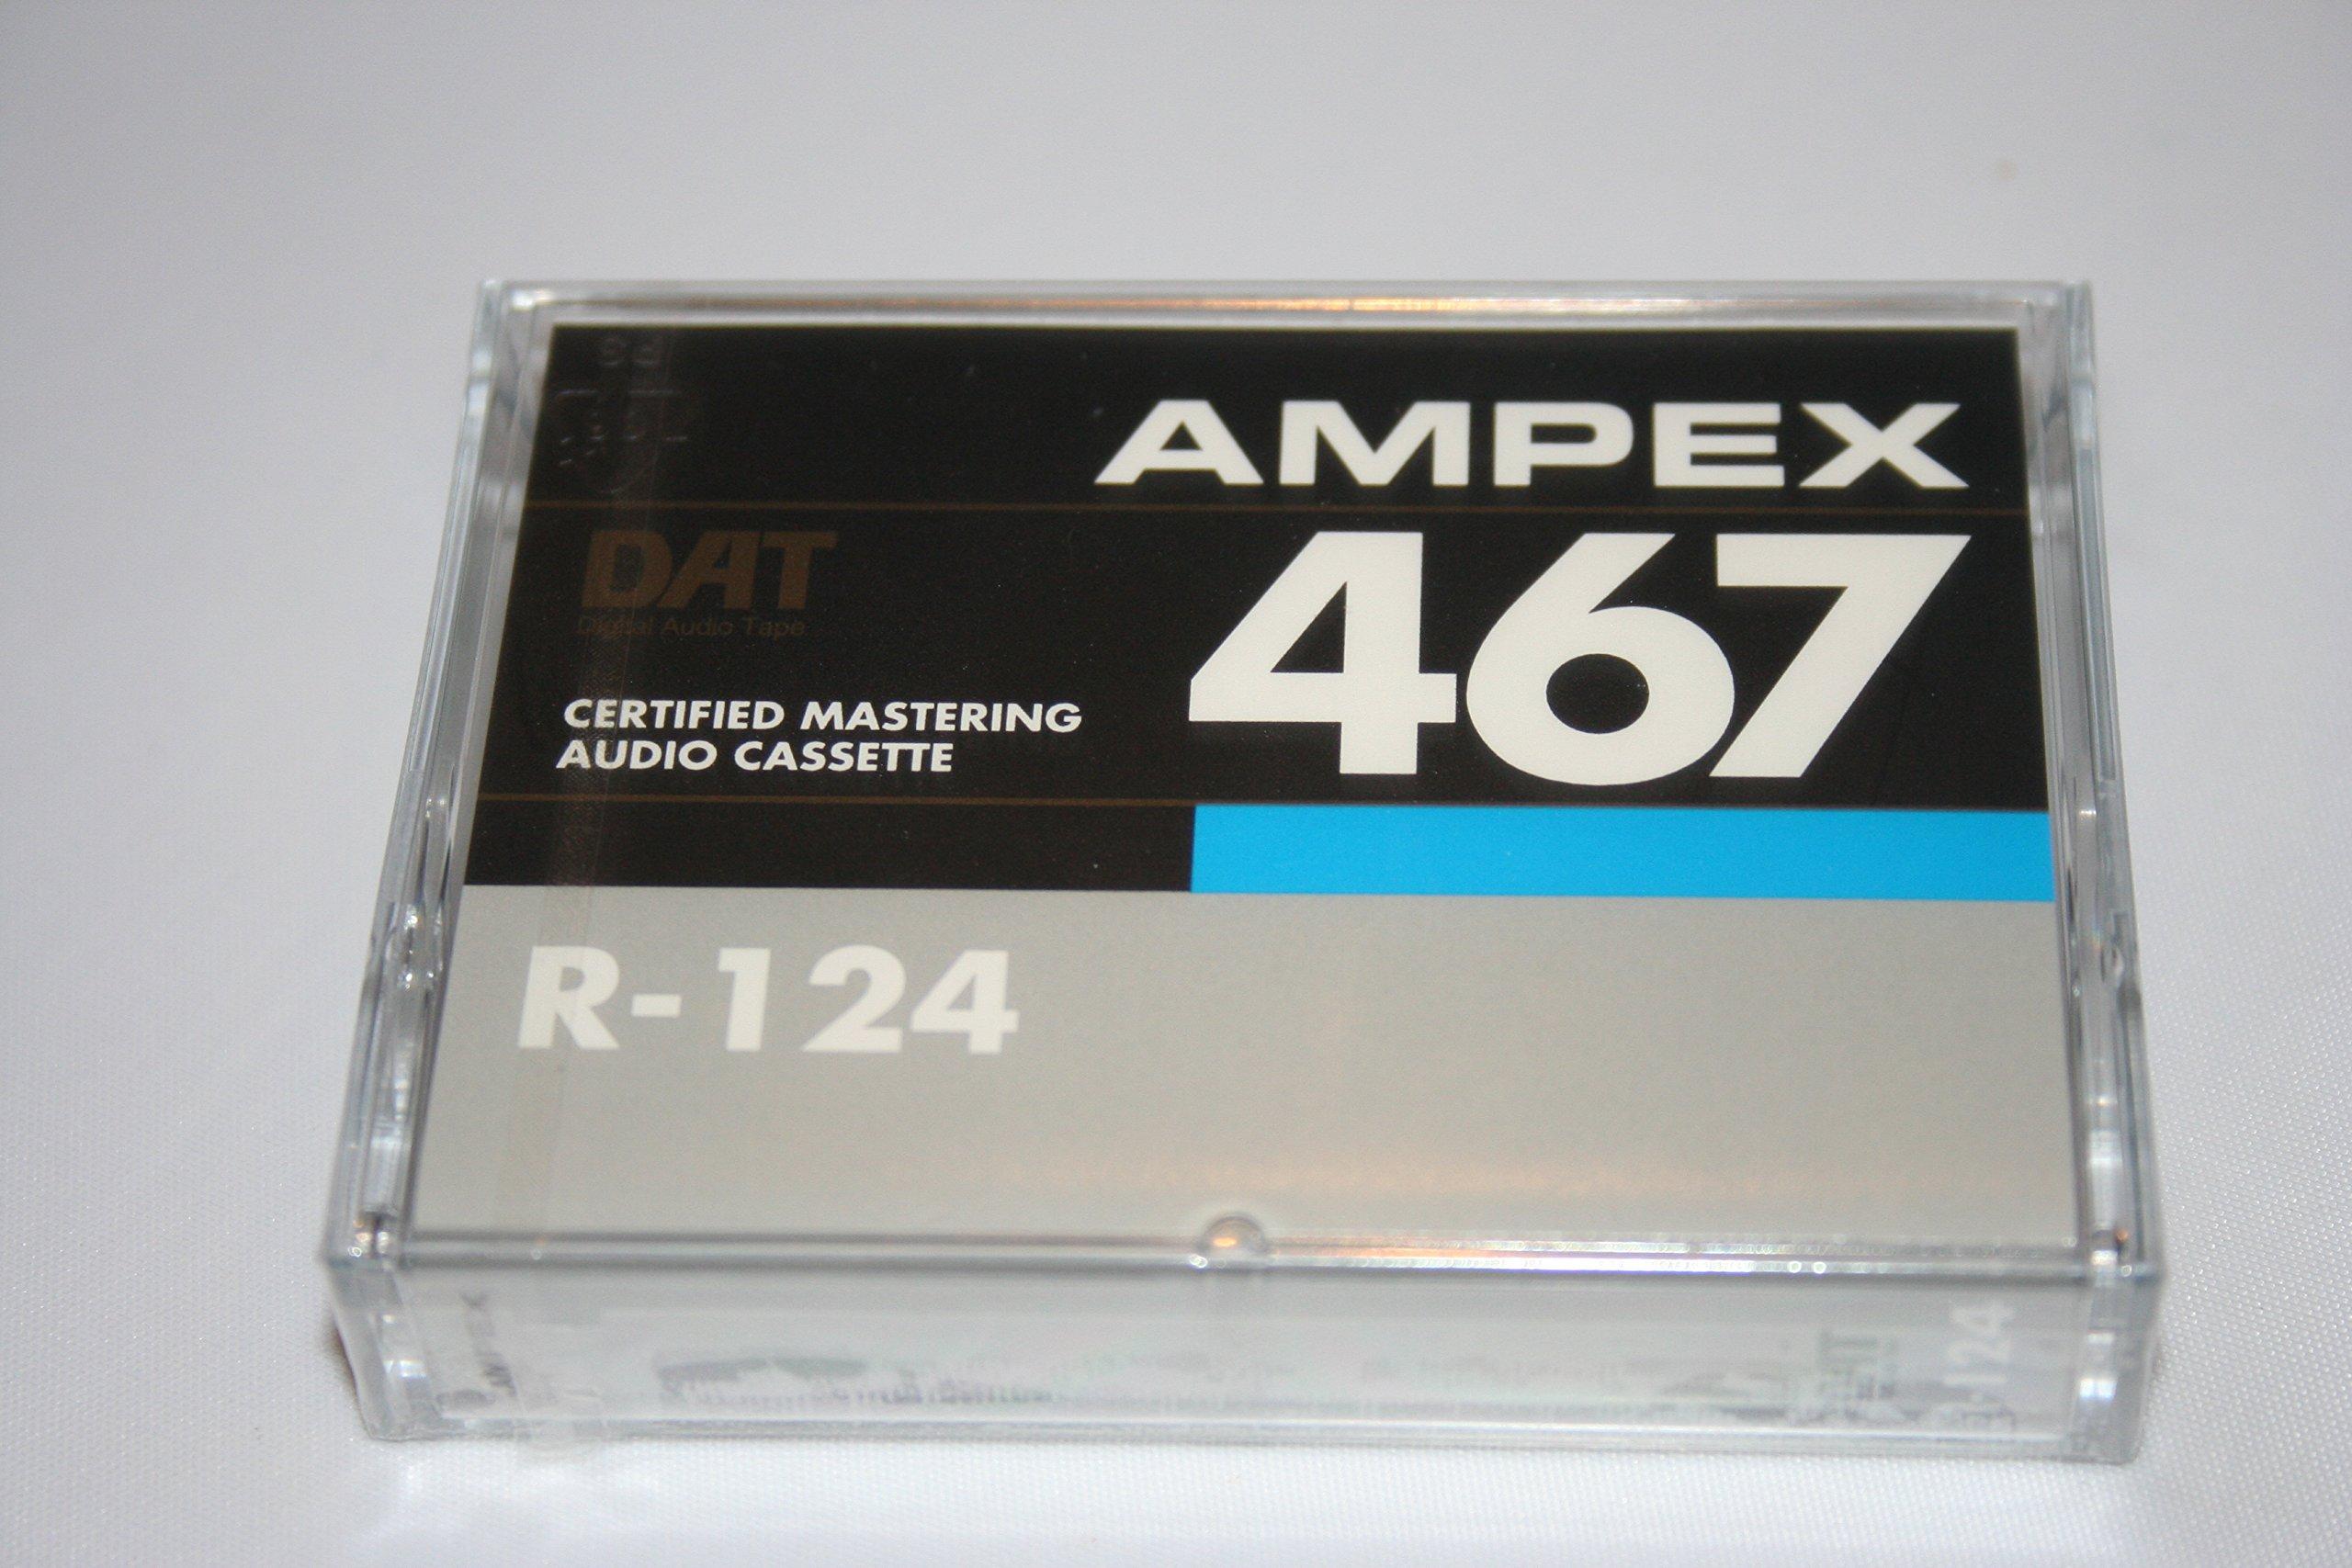 Quantegy Ampex 467 R-124 Certified Mastering Audio Tape Cassette DAT 4mm Audio 124 minutes